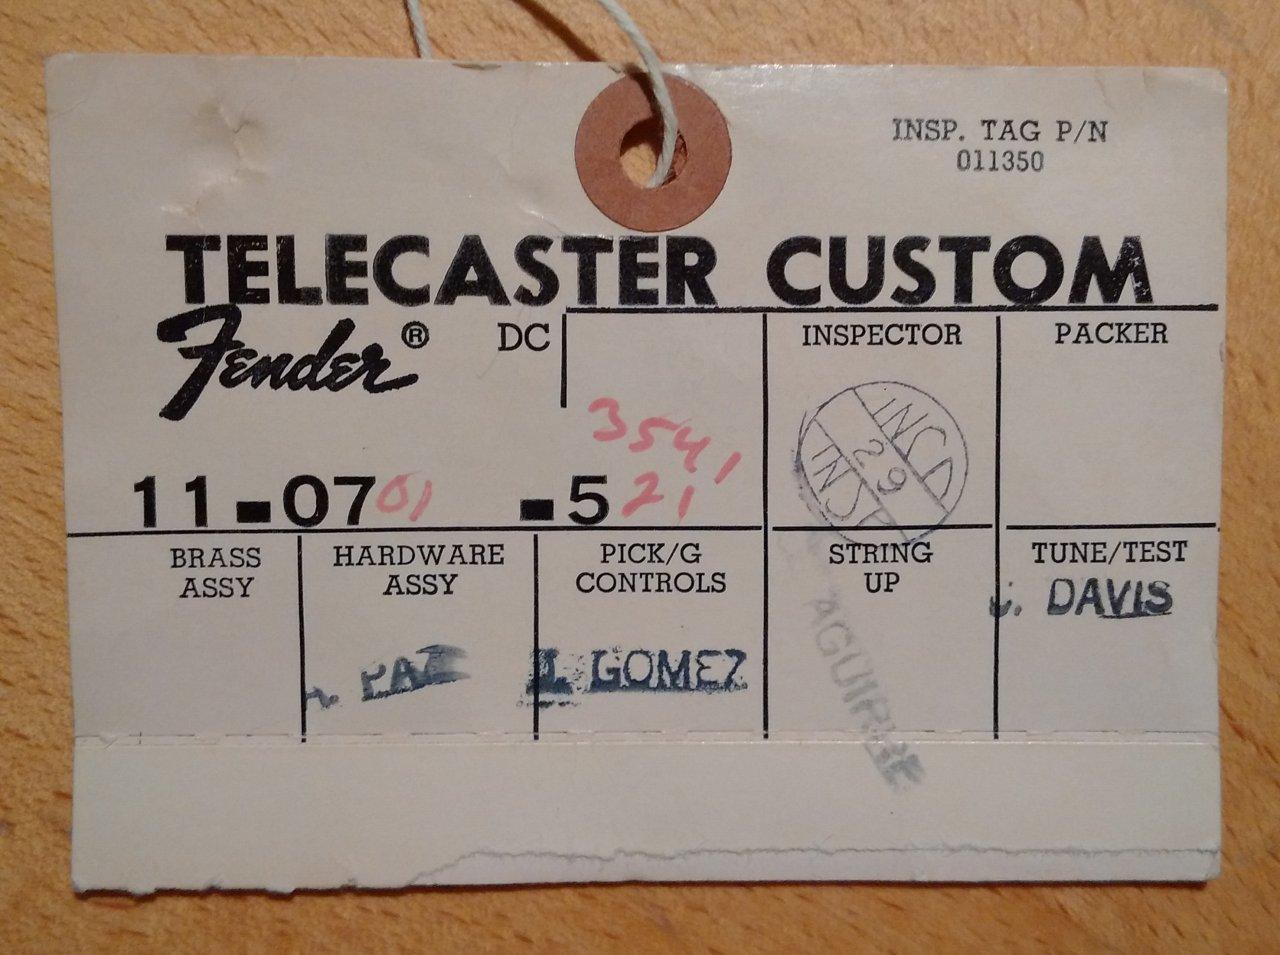 Telecaster Custom Inspection Tag.jpg